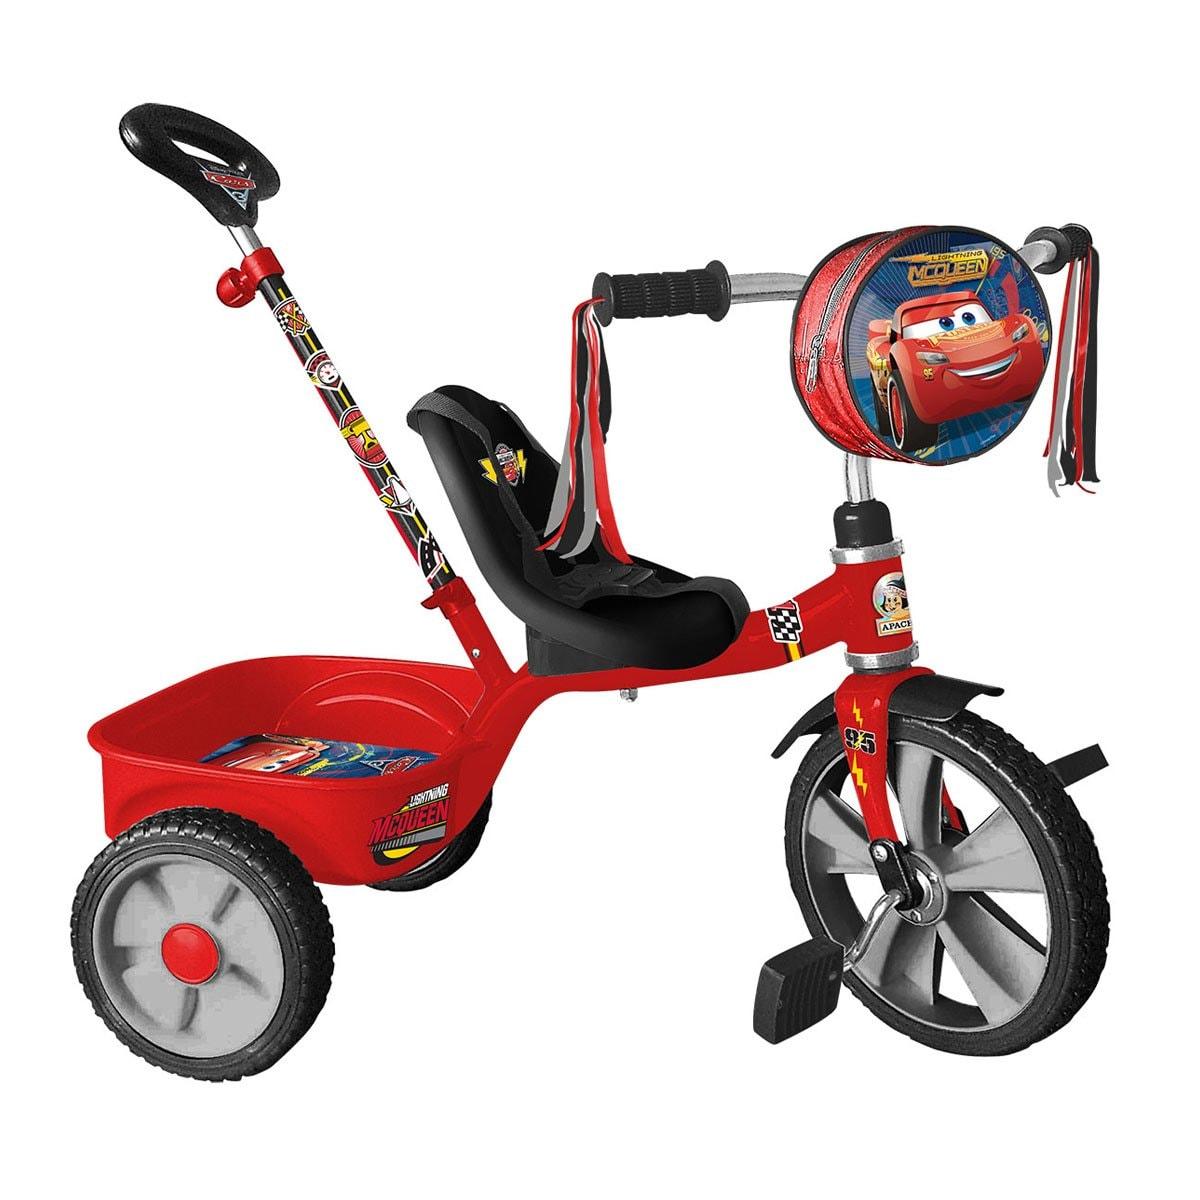 Triciclo Cars R12 Bicileyca